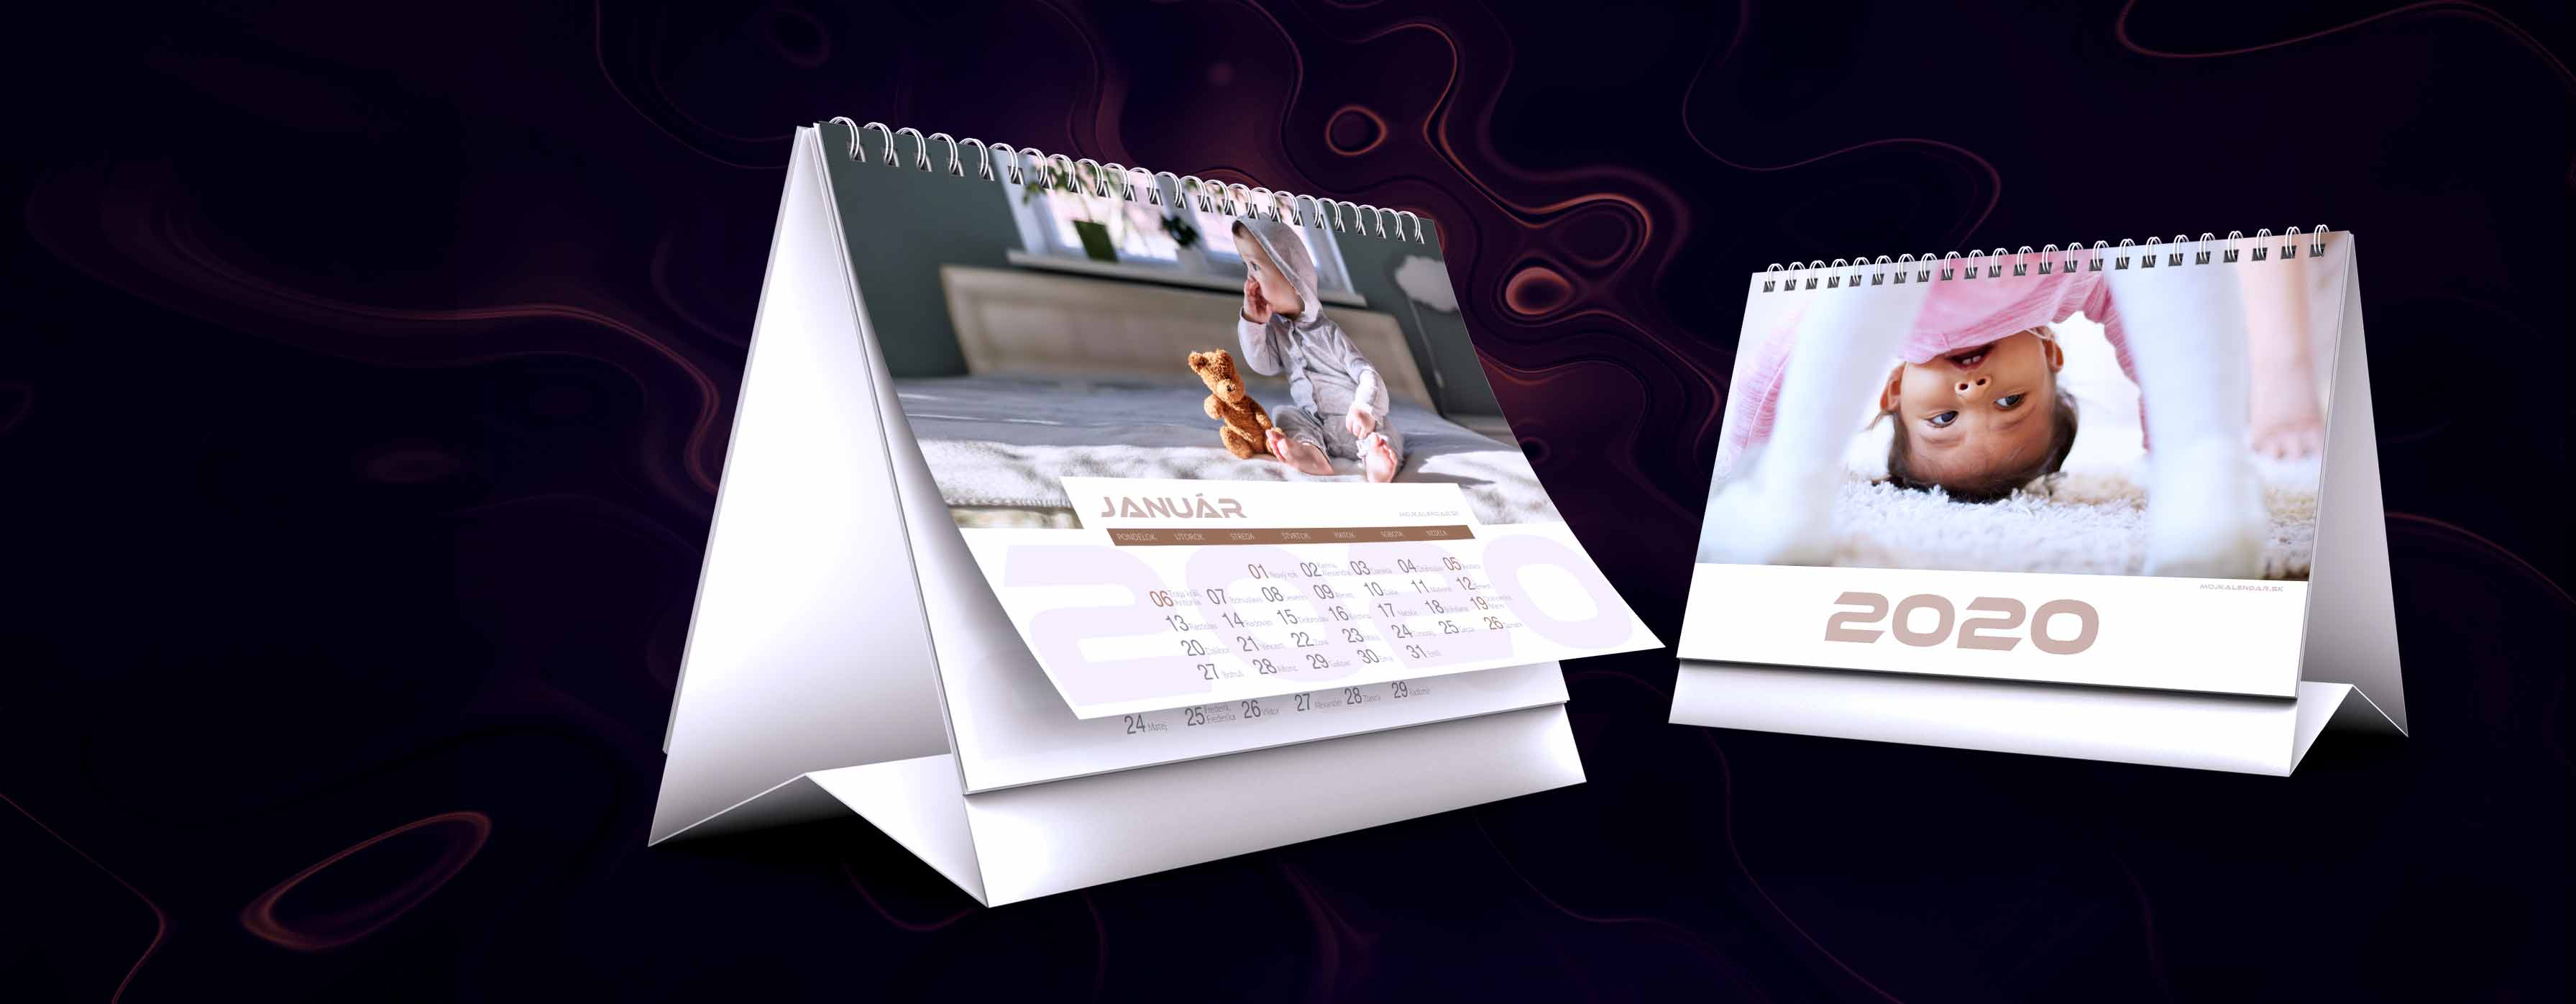 Kalendáre z vlastných fotiek - slider